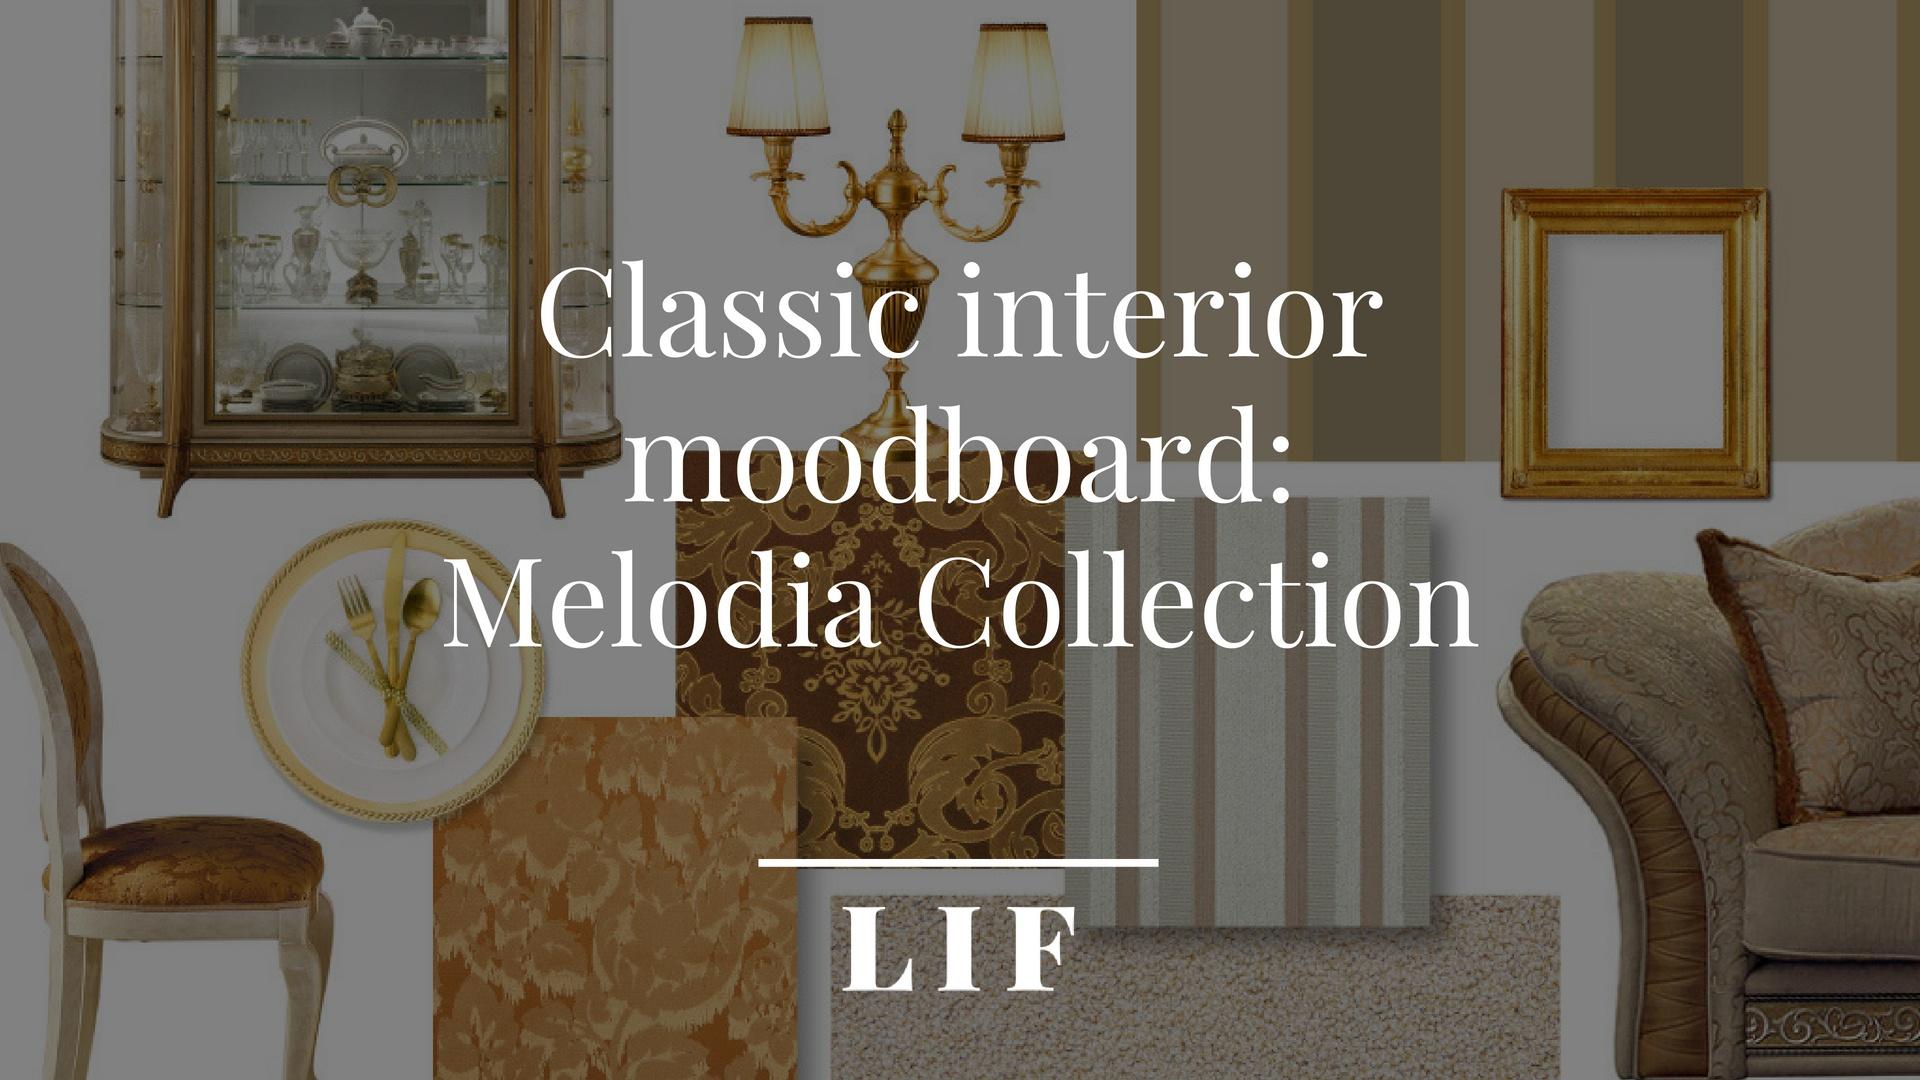 Classic interior moodboard-melodia collection